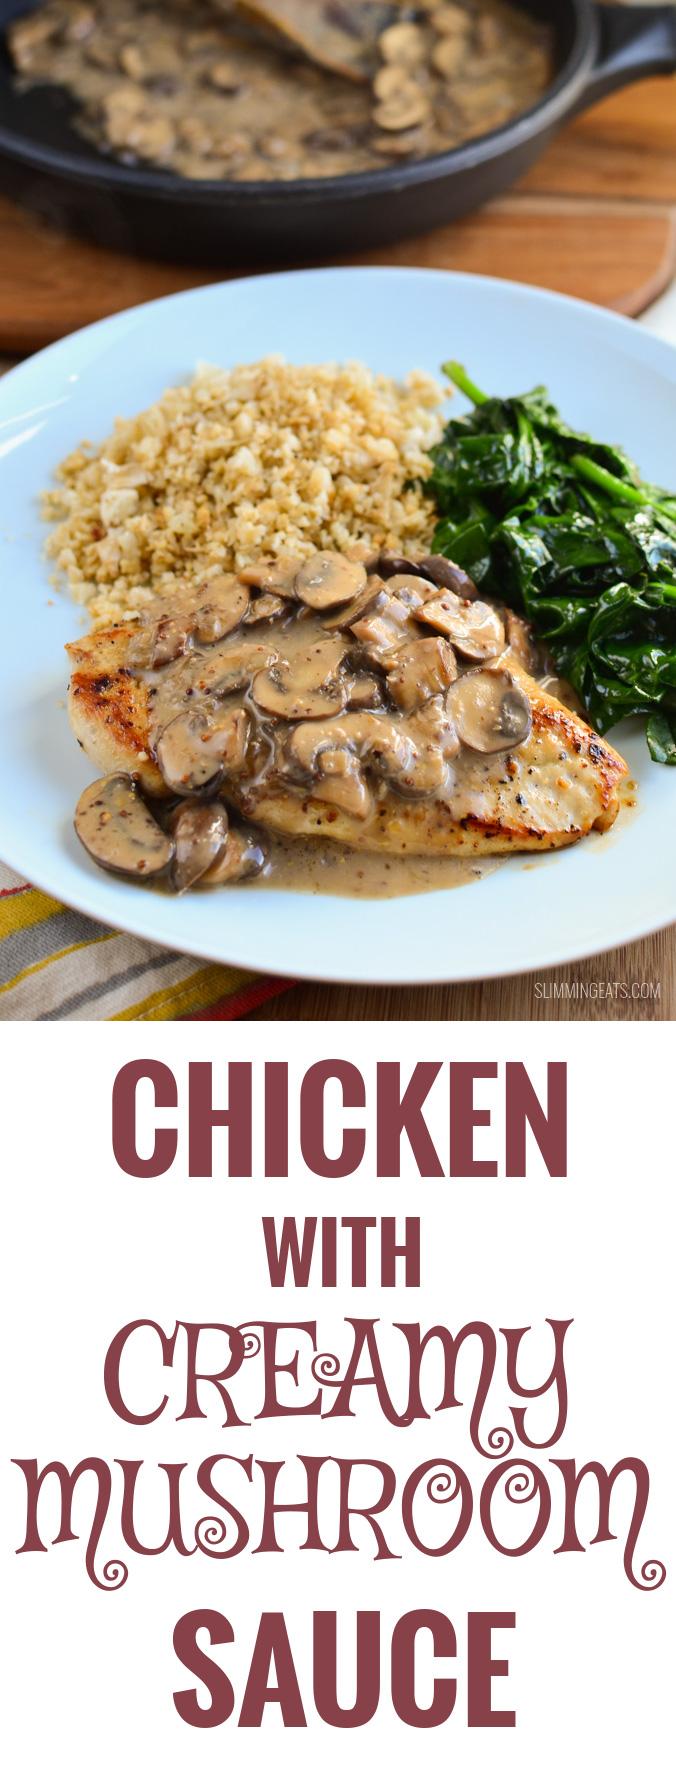 Slimming Eats Chicken in Creamy Mushroom Sauce - gluten free, dairy free, paleo, Whole30, Slimming World and Weight Watchers friendly